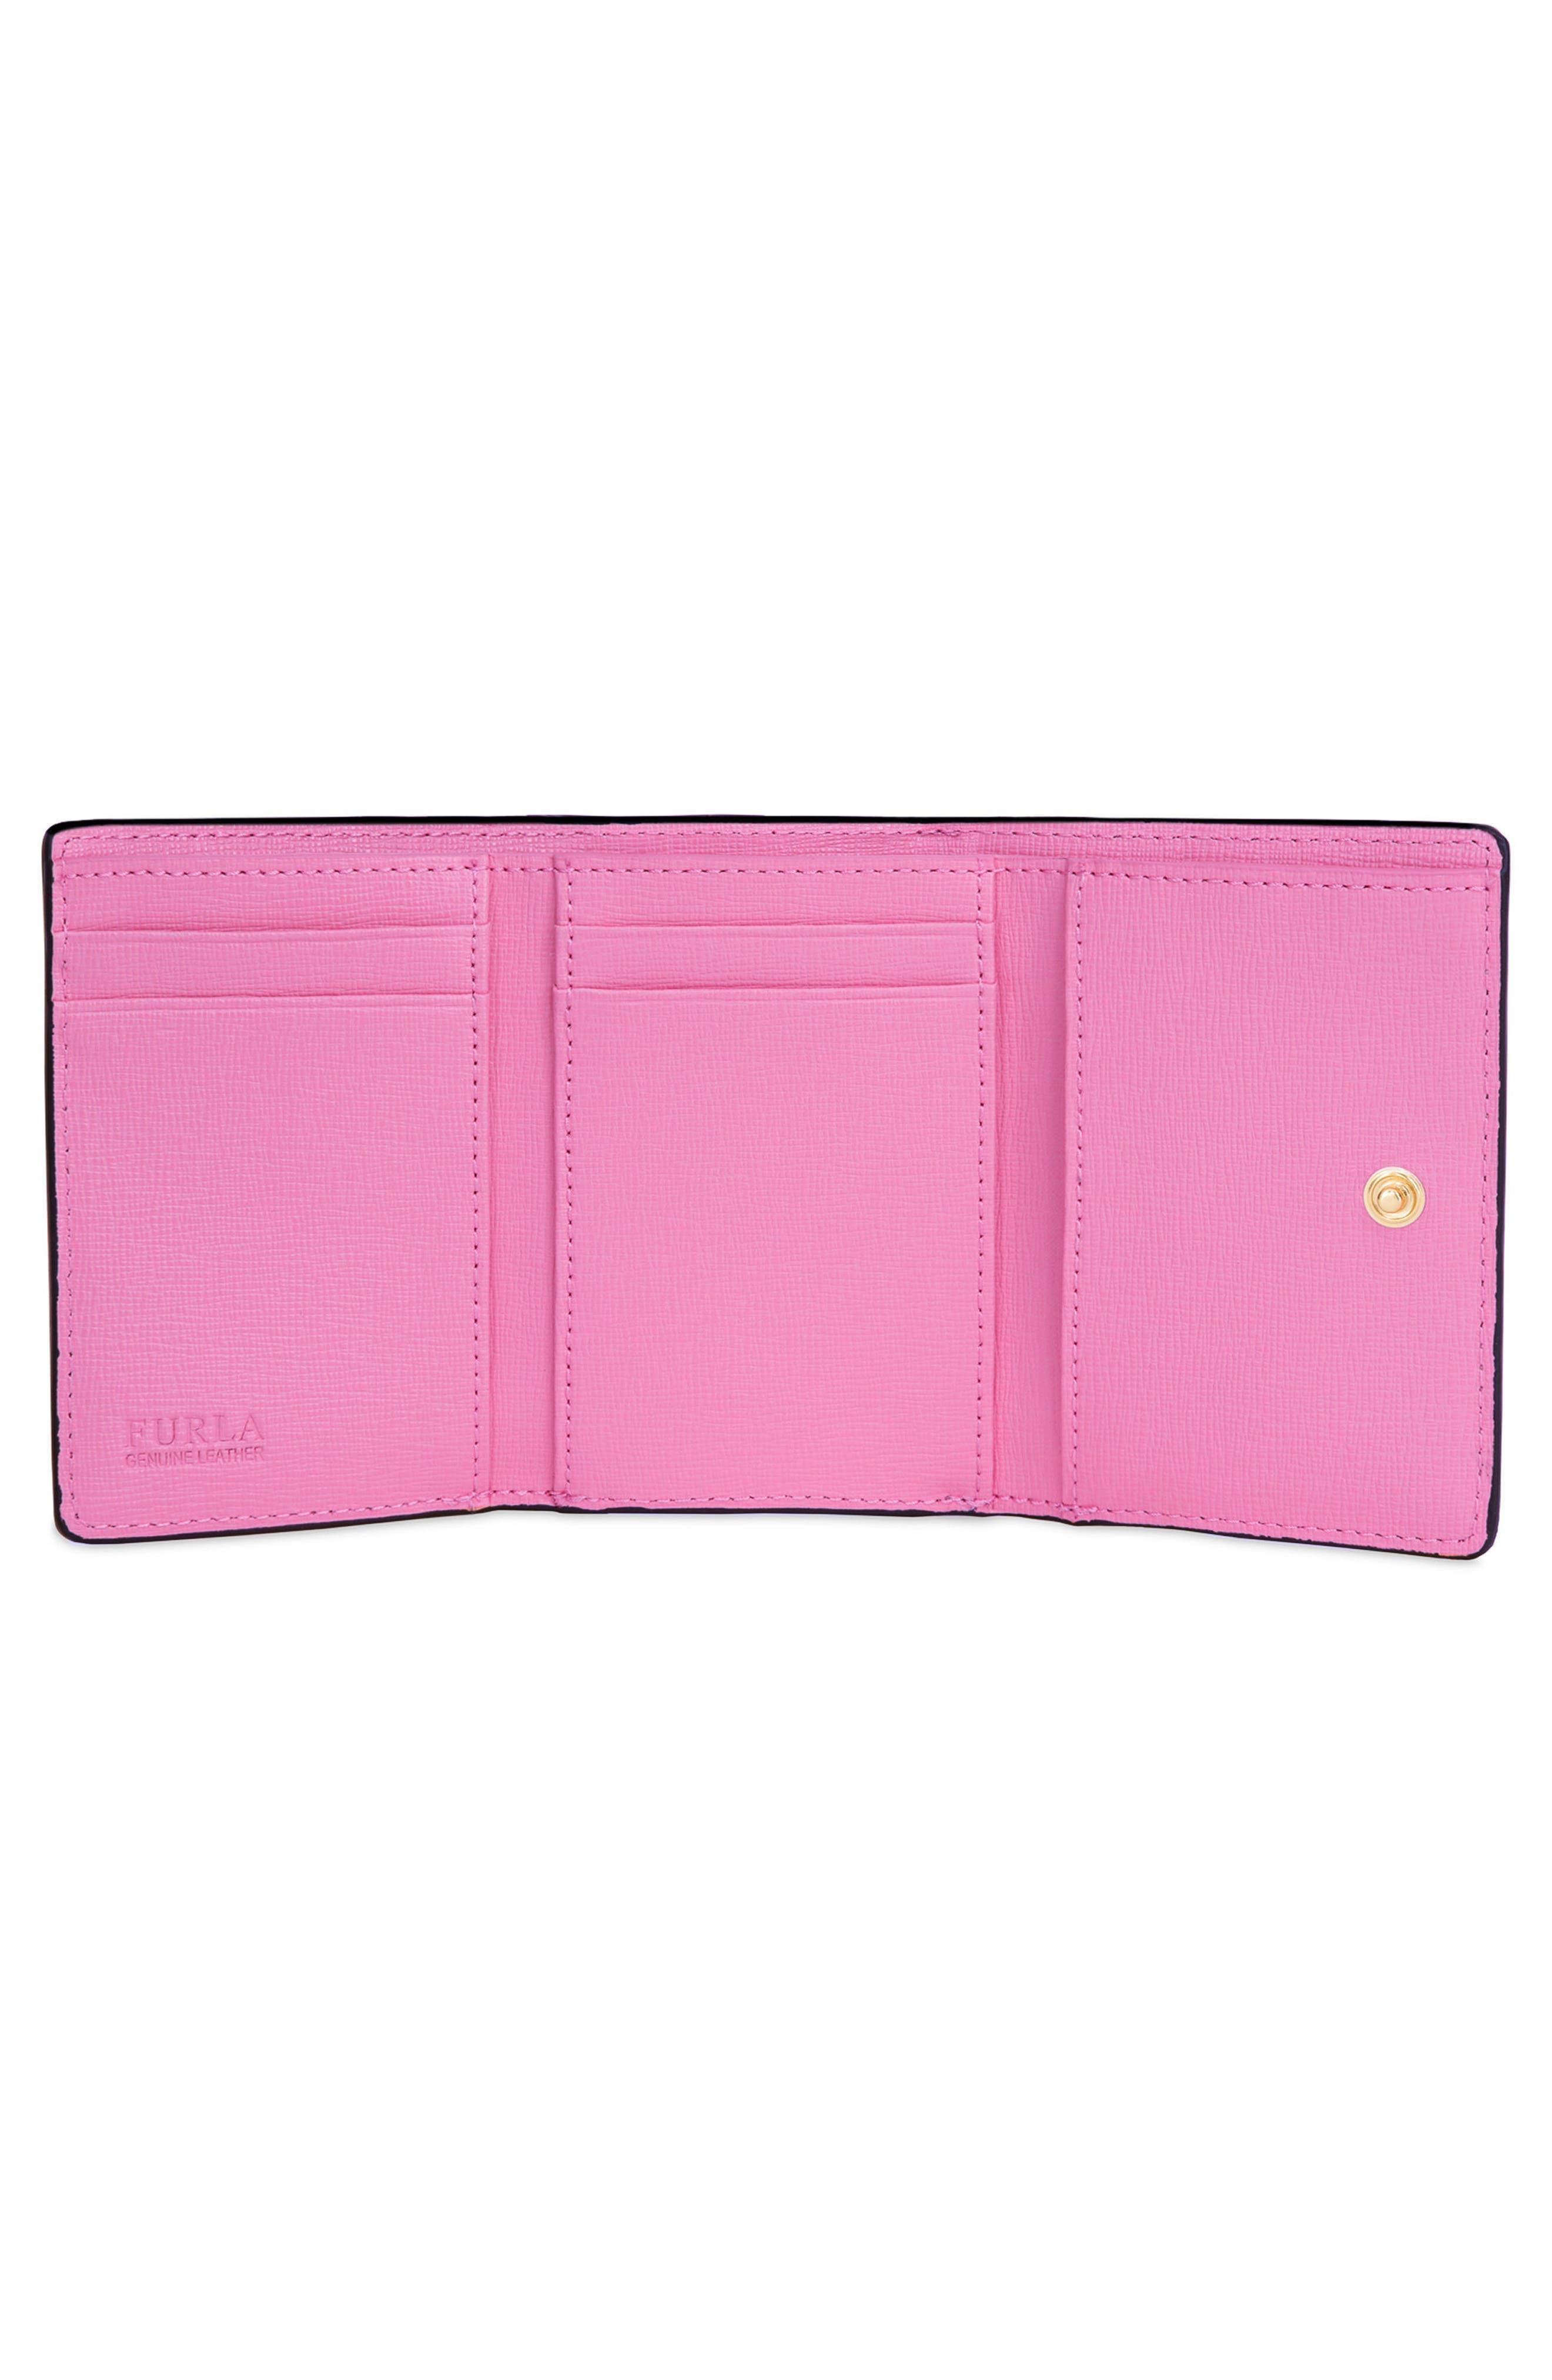 Babylon Saffiano Leather Trifold Wallet,                             Alternate thumbnail 2, color,                             Toni Orchidea